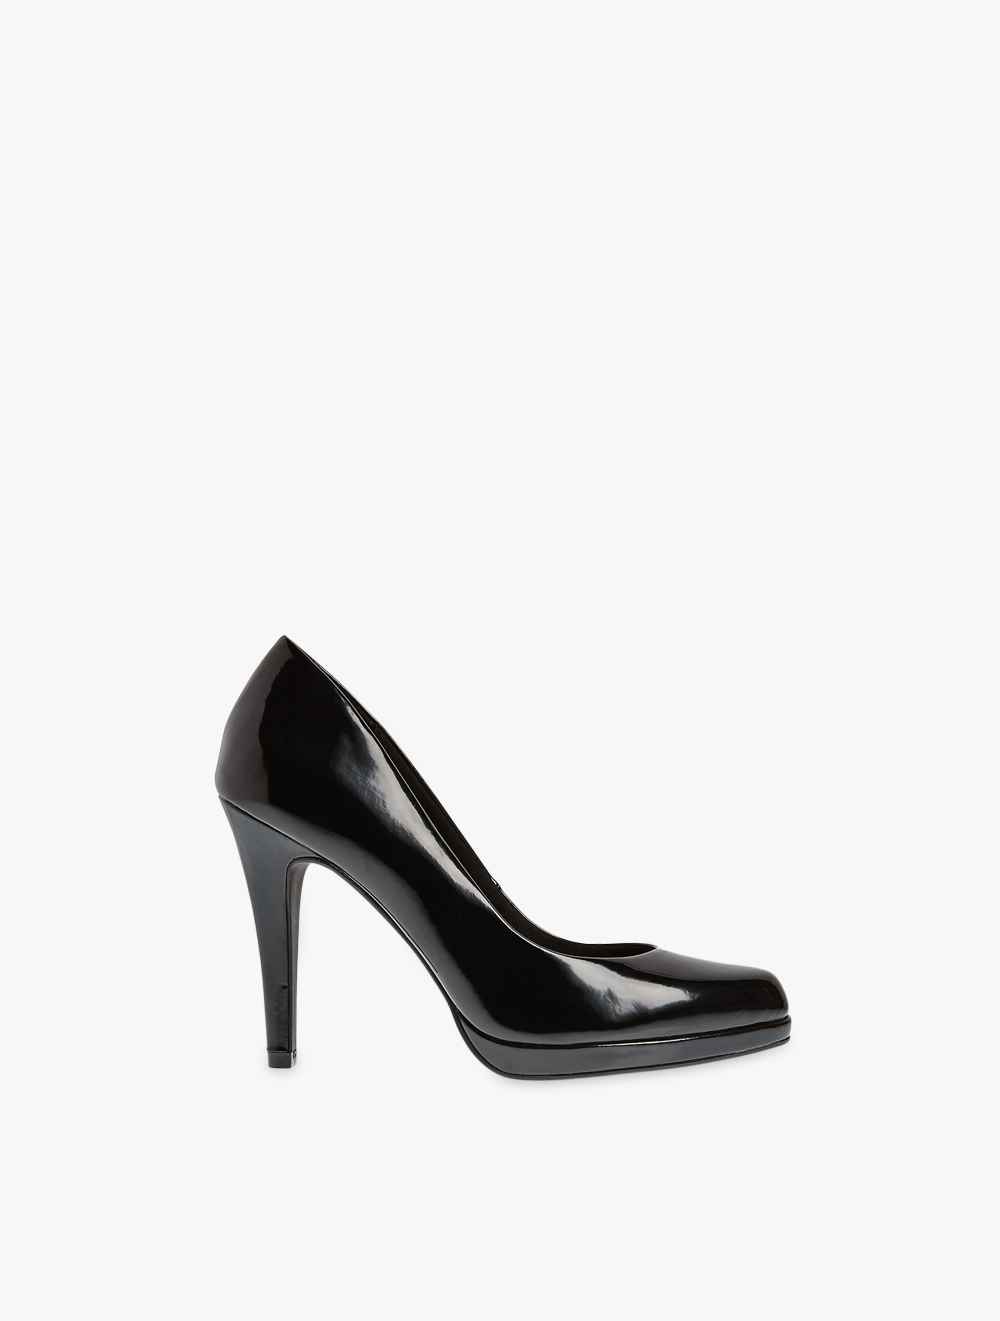 Online Shopping International Lifestyle Branded Product Sepatu Sneakers Pria Bbr378 Buy Now